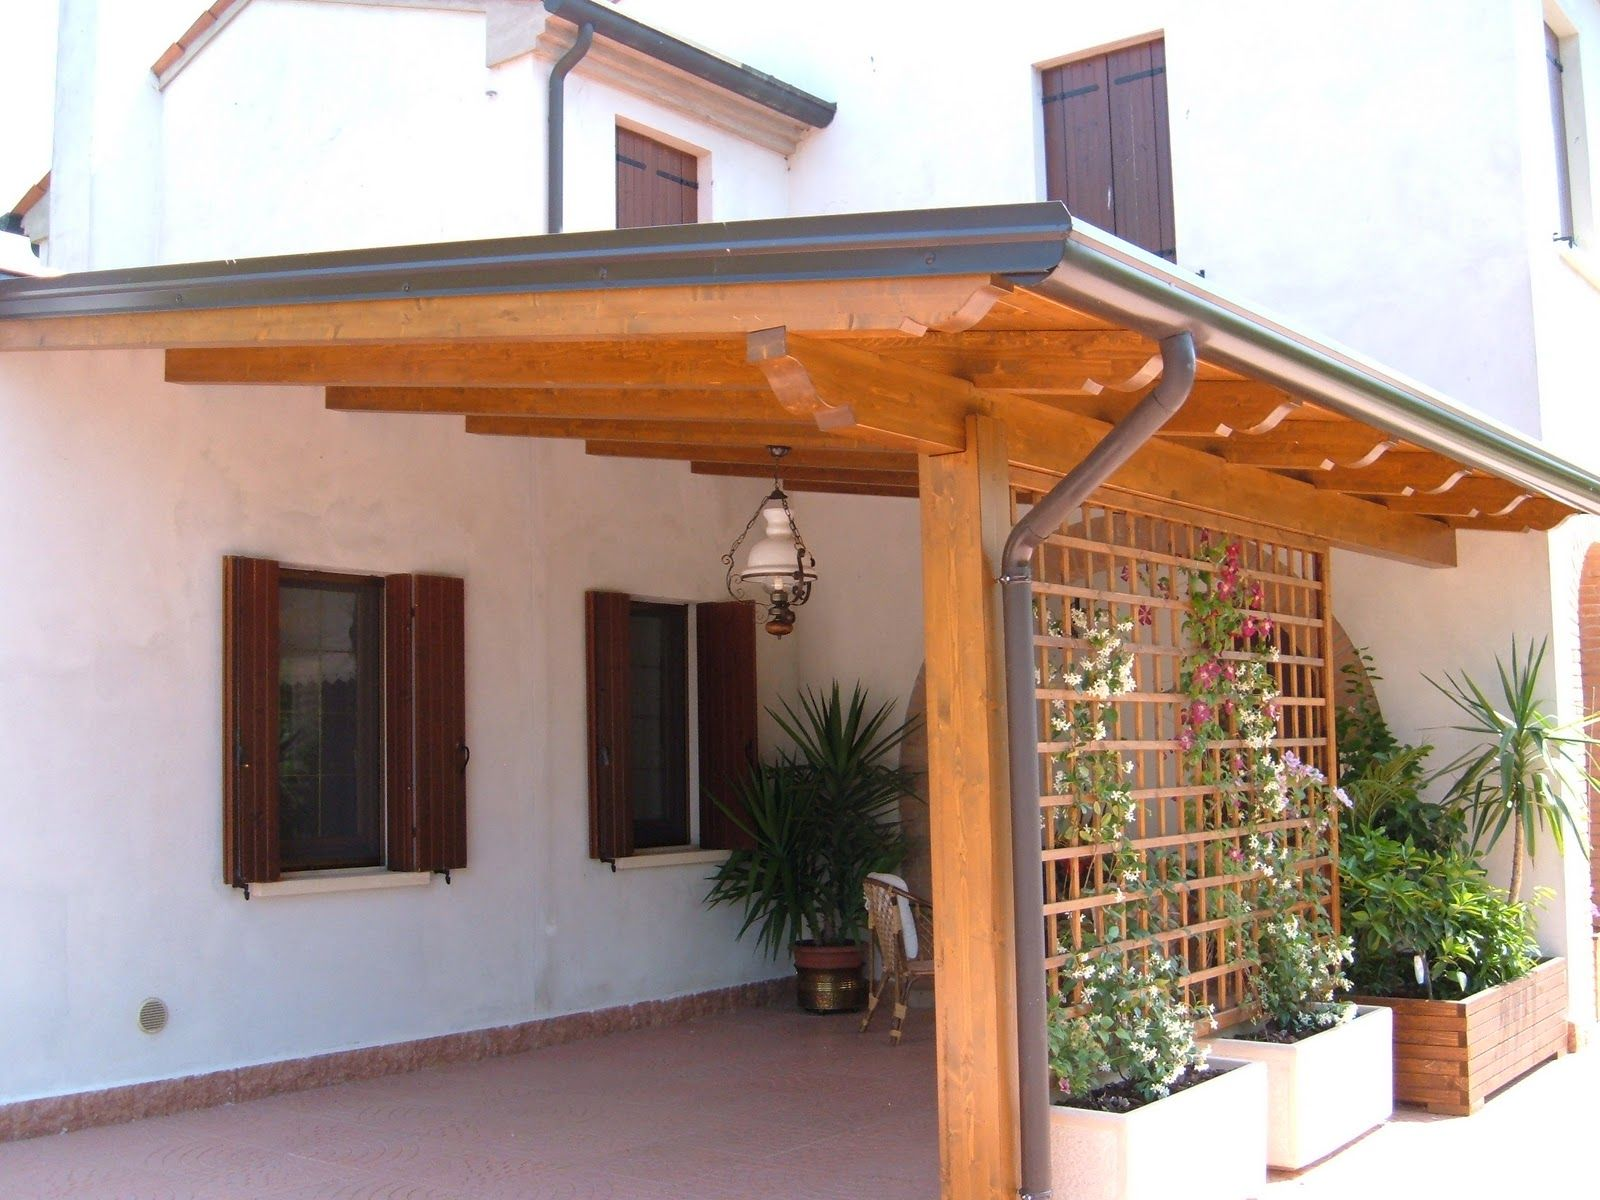 Maderas dise os proyectos varias cosas for Patios y terrazas disenos